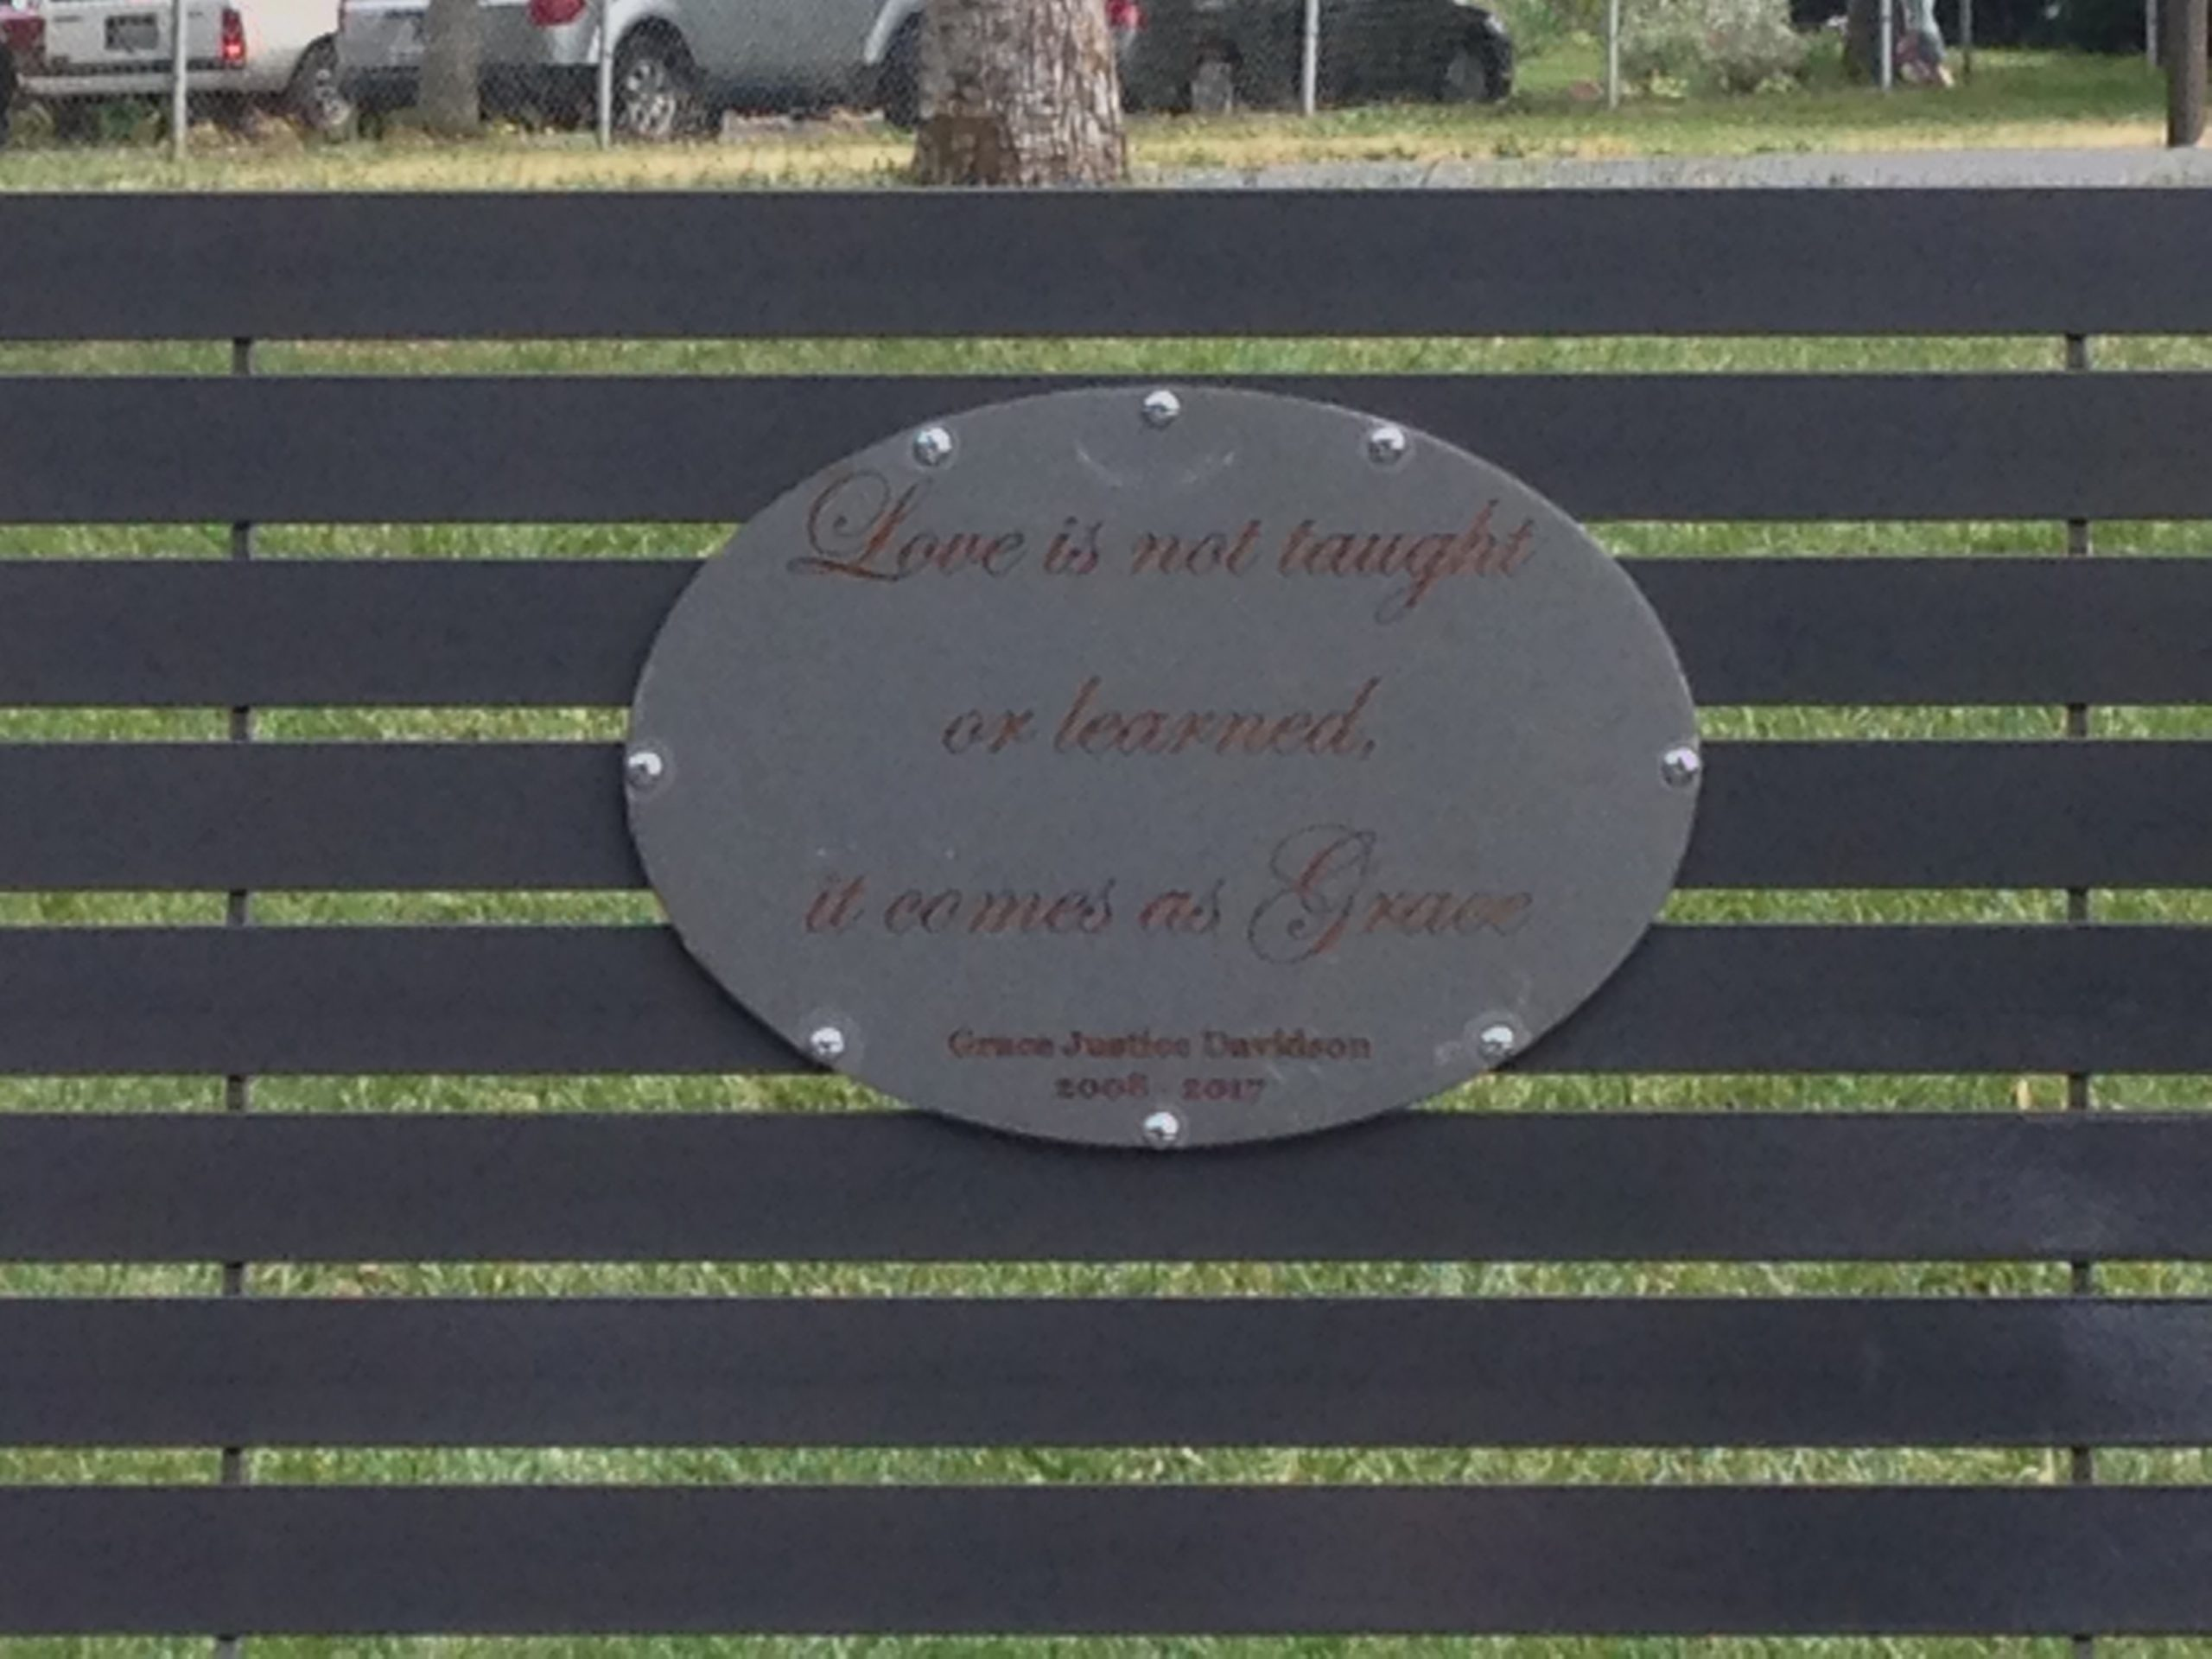 Graces Memorial Bench